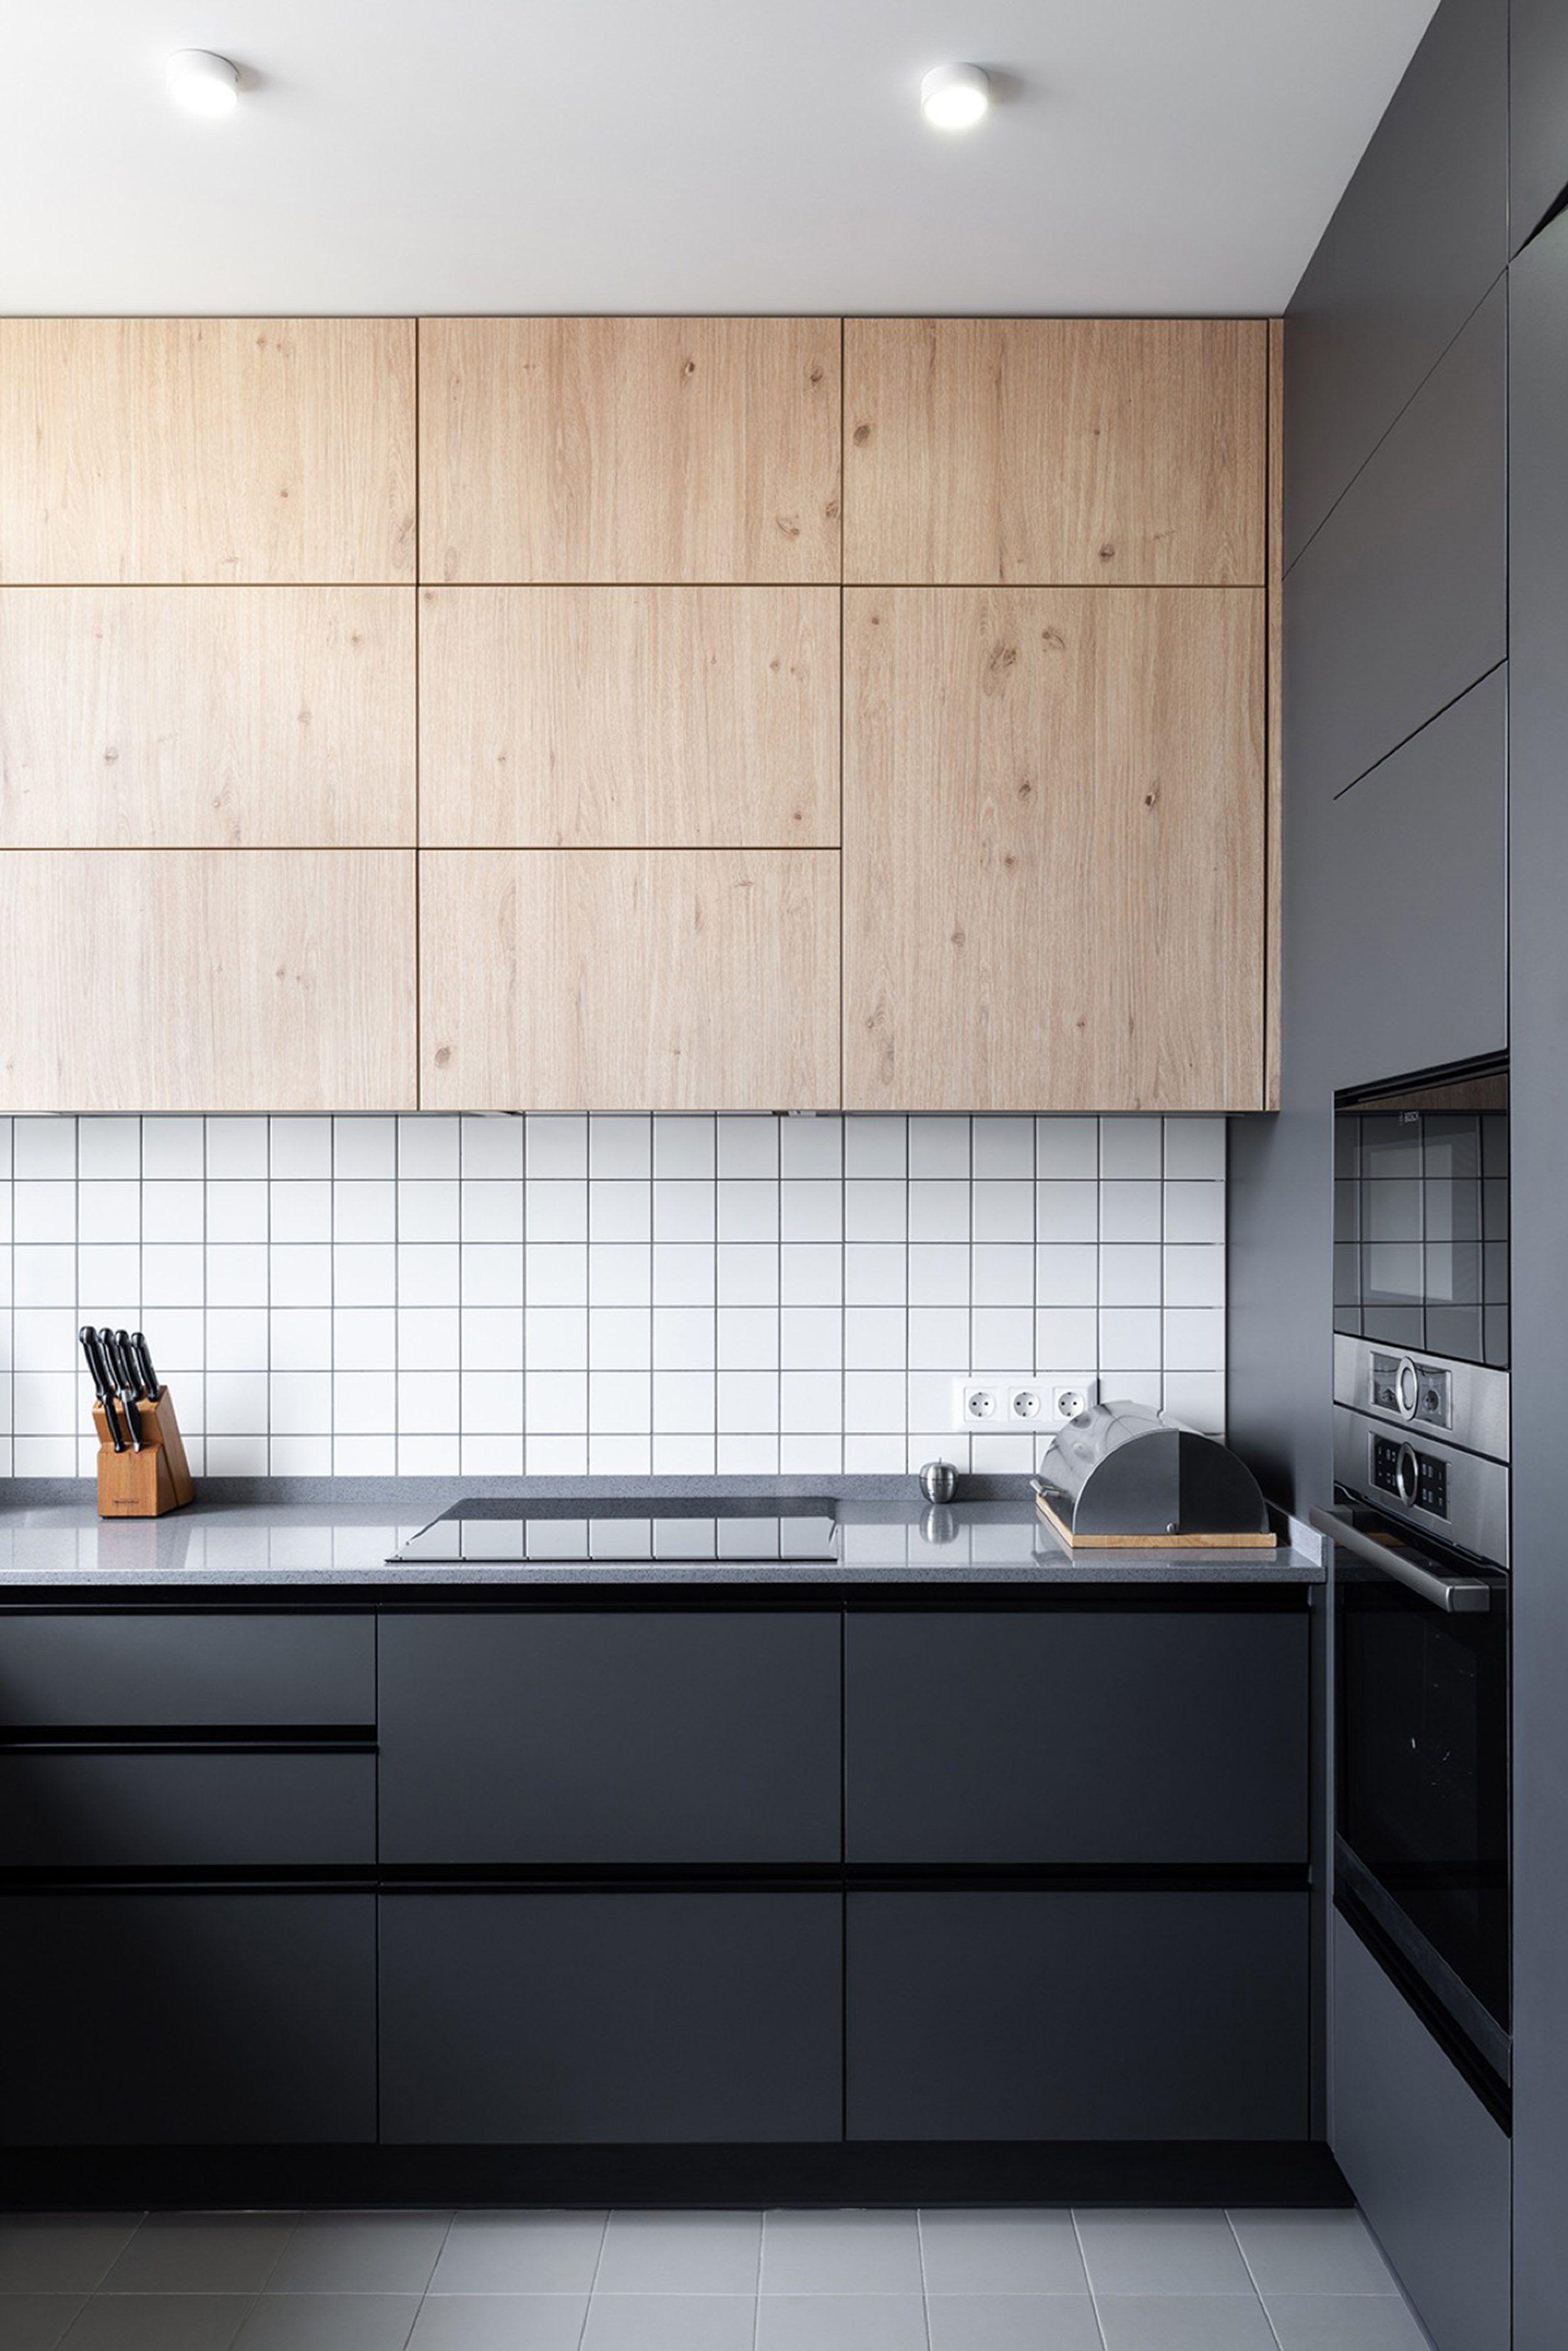 Is No Hardware The New Hardware Trend For Kitchens Modern Kitchen Design Kitchen Cabinet Colors Interior Design Kitchen